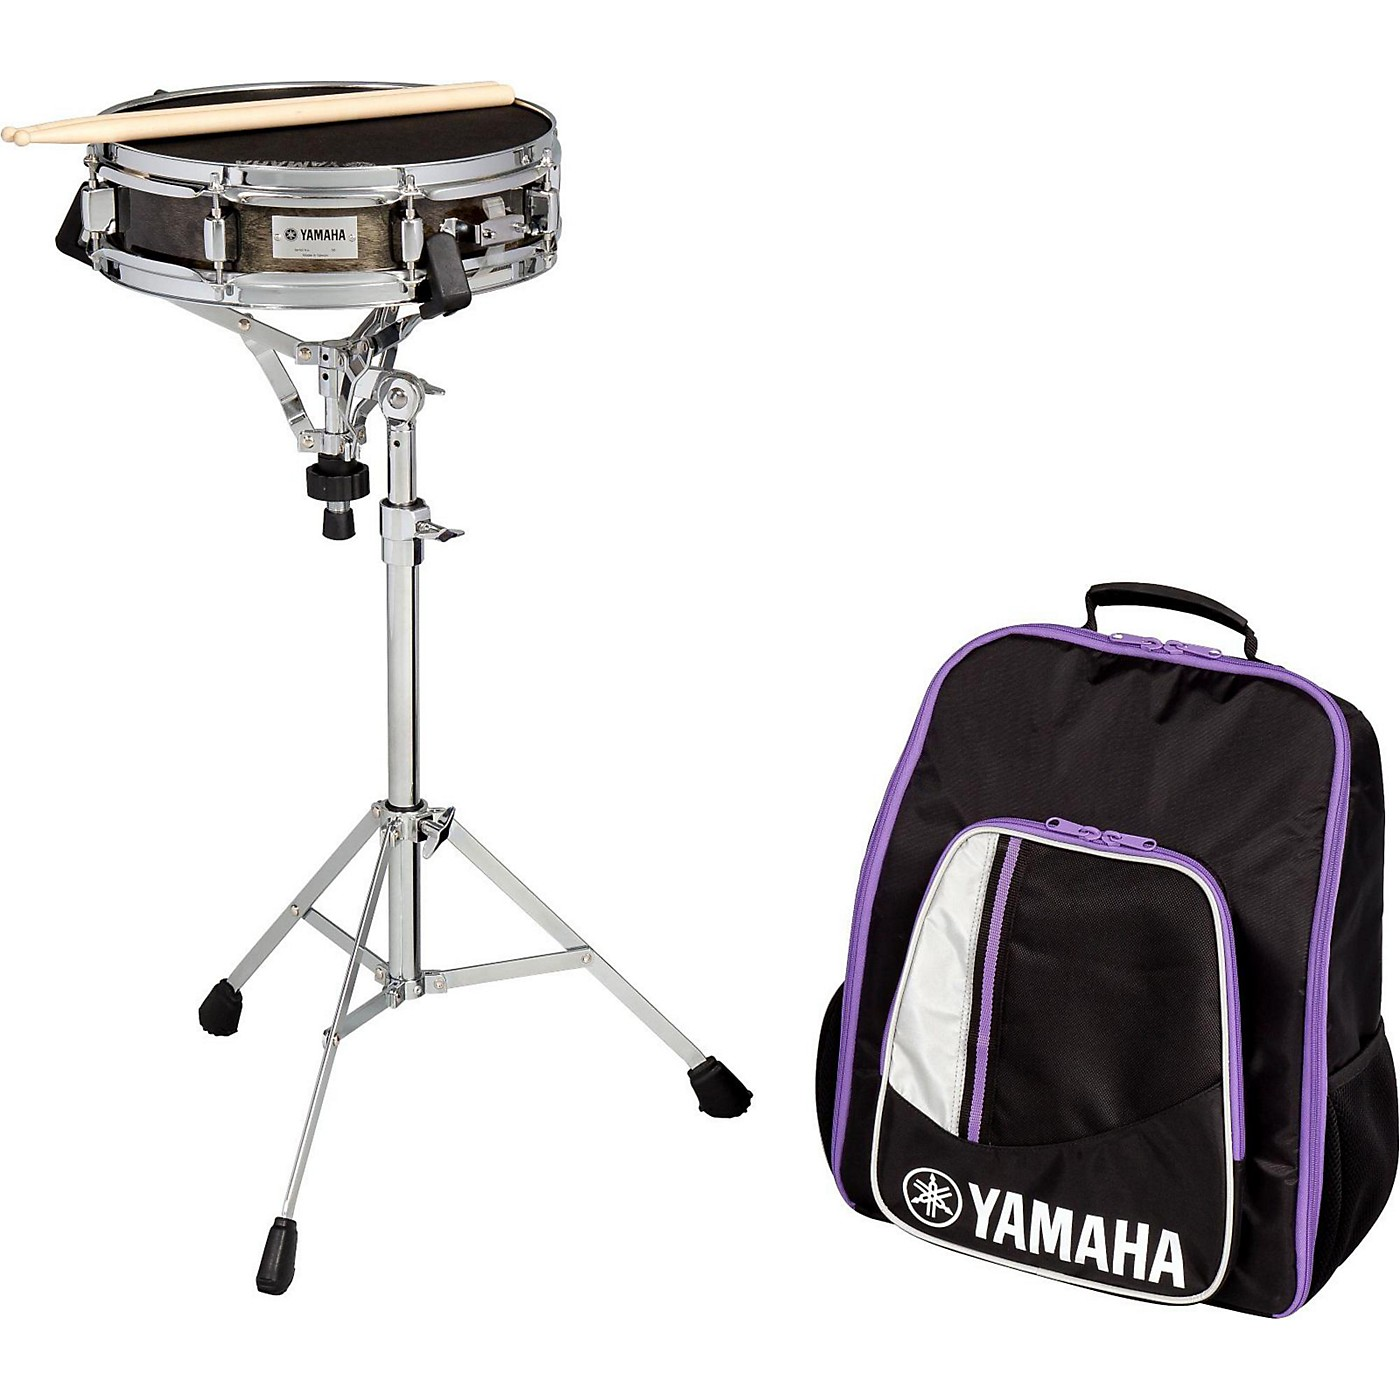 Yamaha 285 Series Mini Snare Kit with Backpack thumbnail